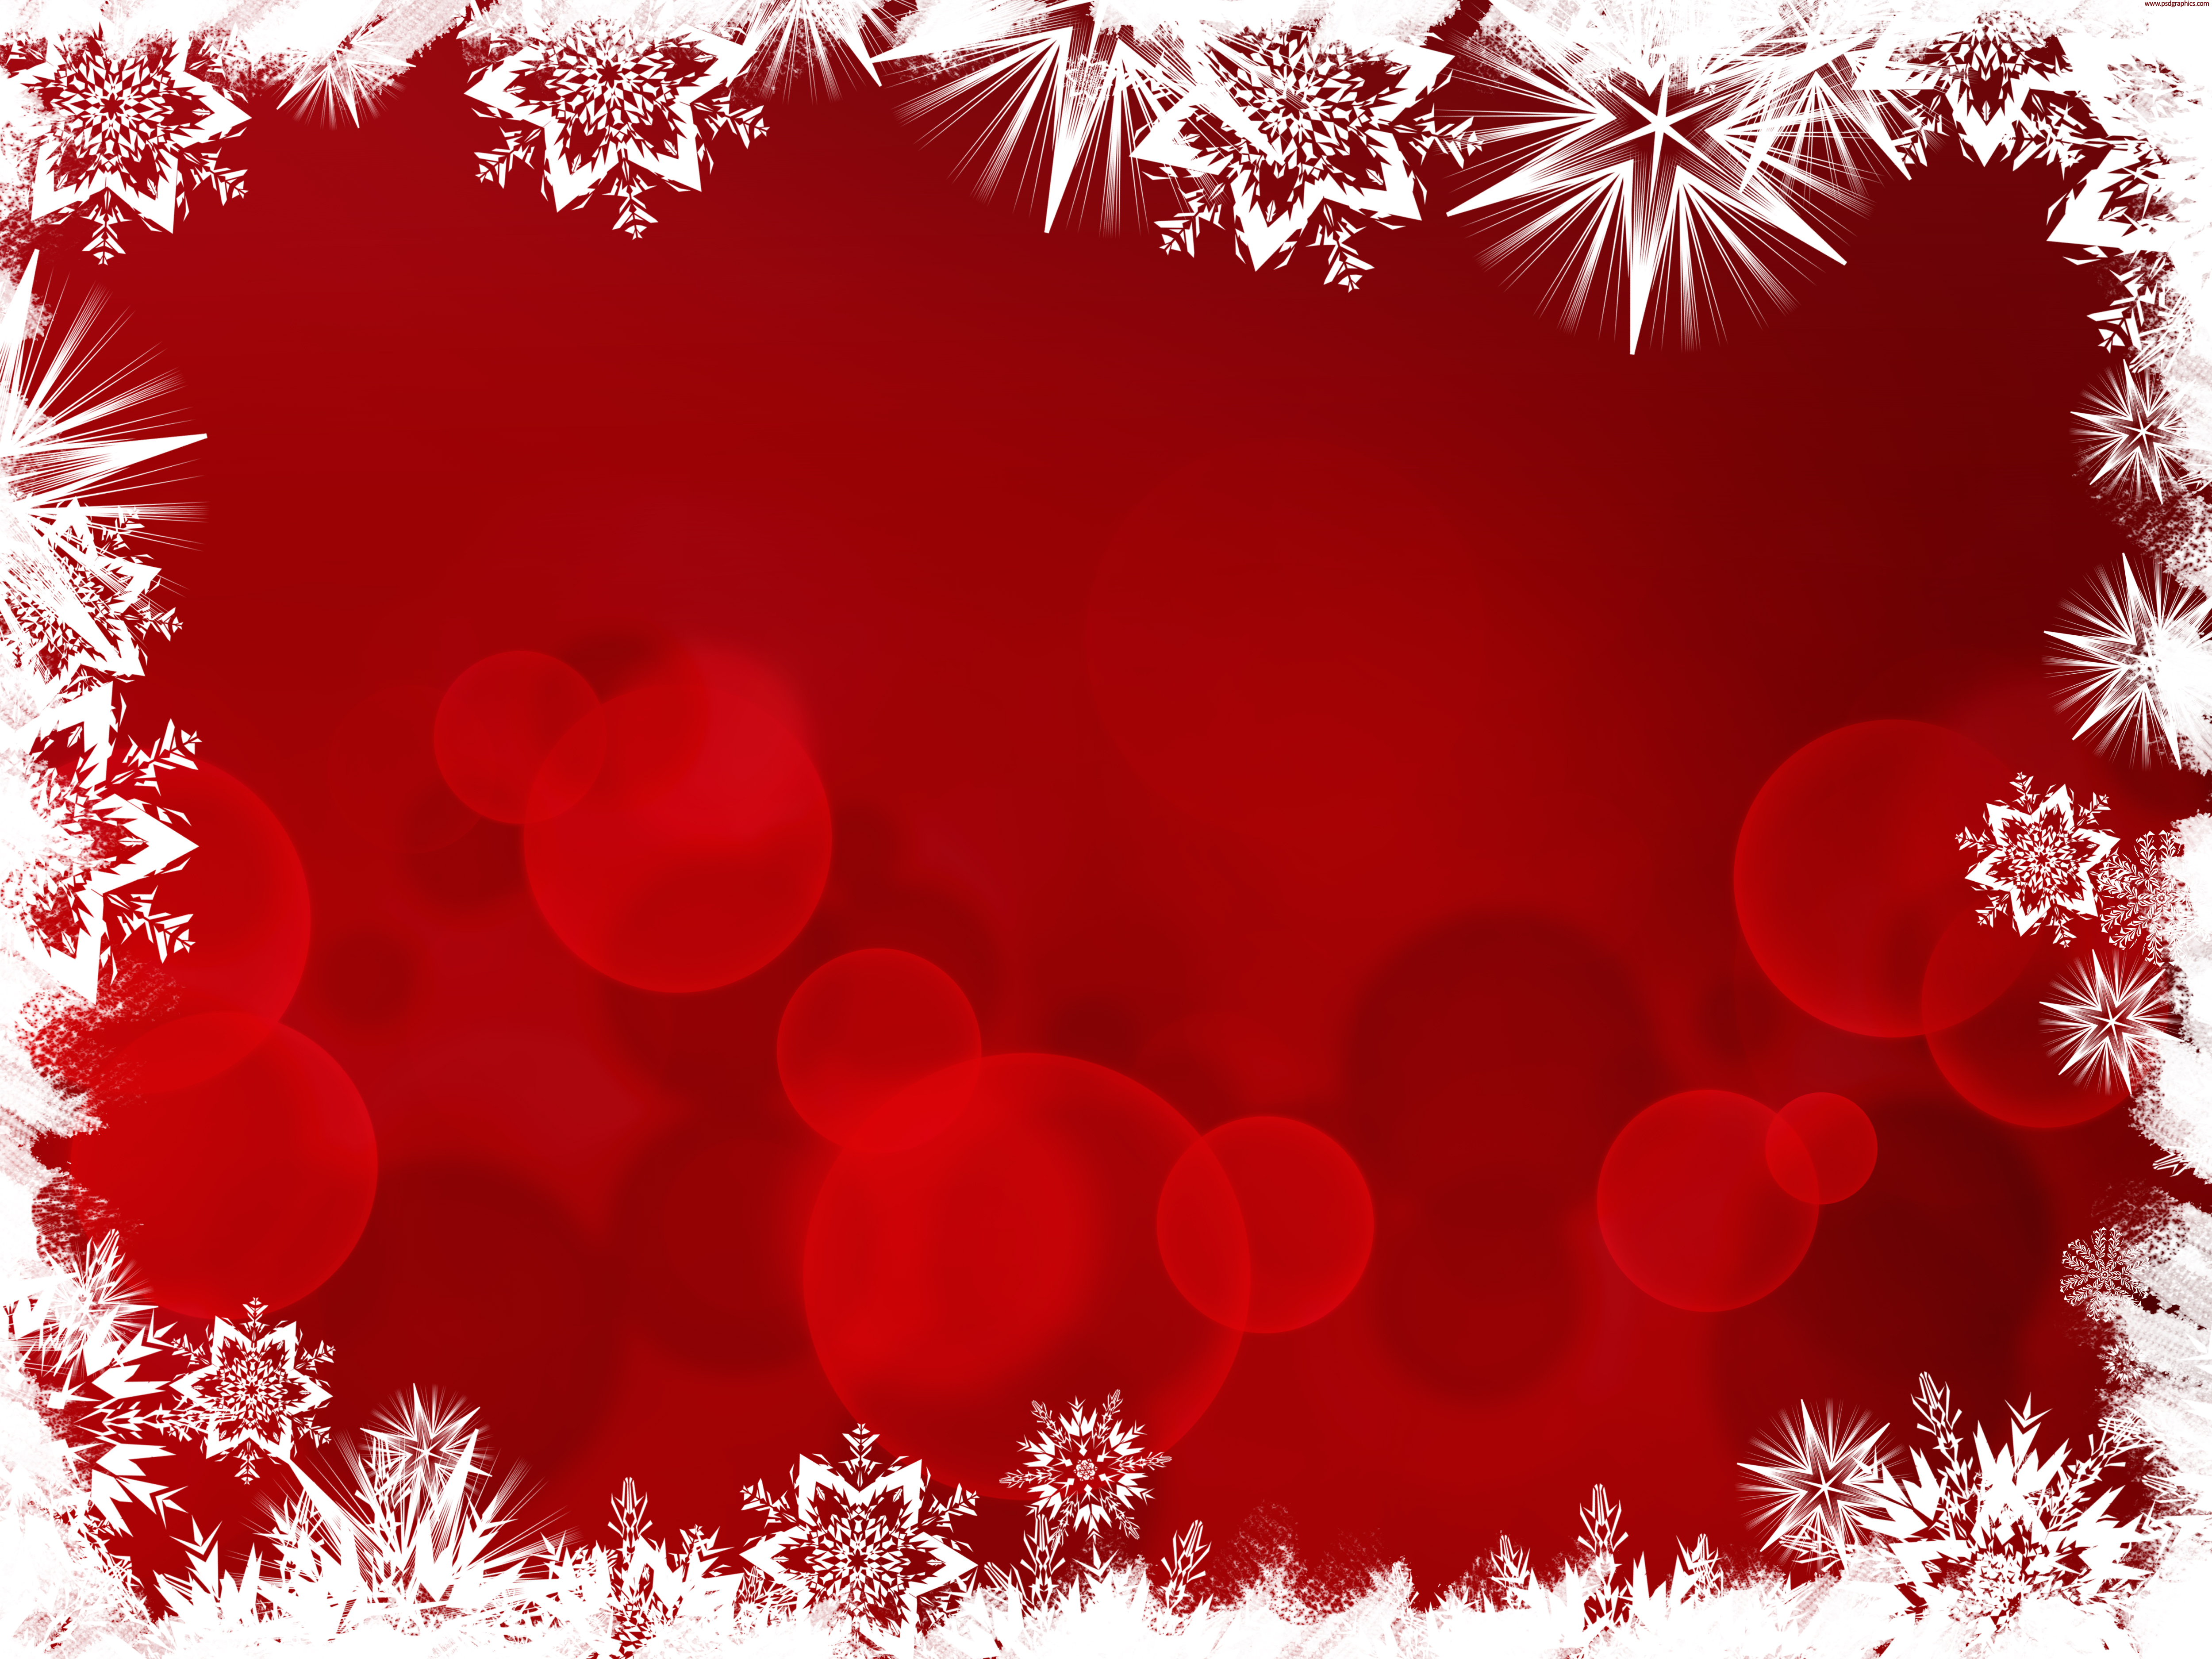 Chrismas Backgrounds - WallpaperSafari Christmas Tree Decorations 2013